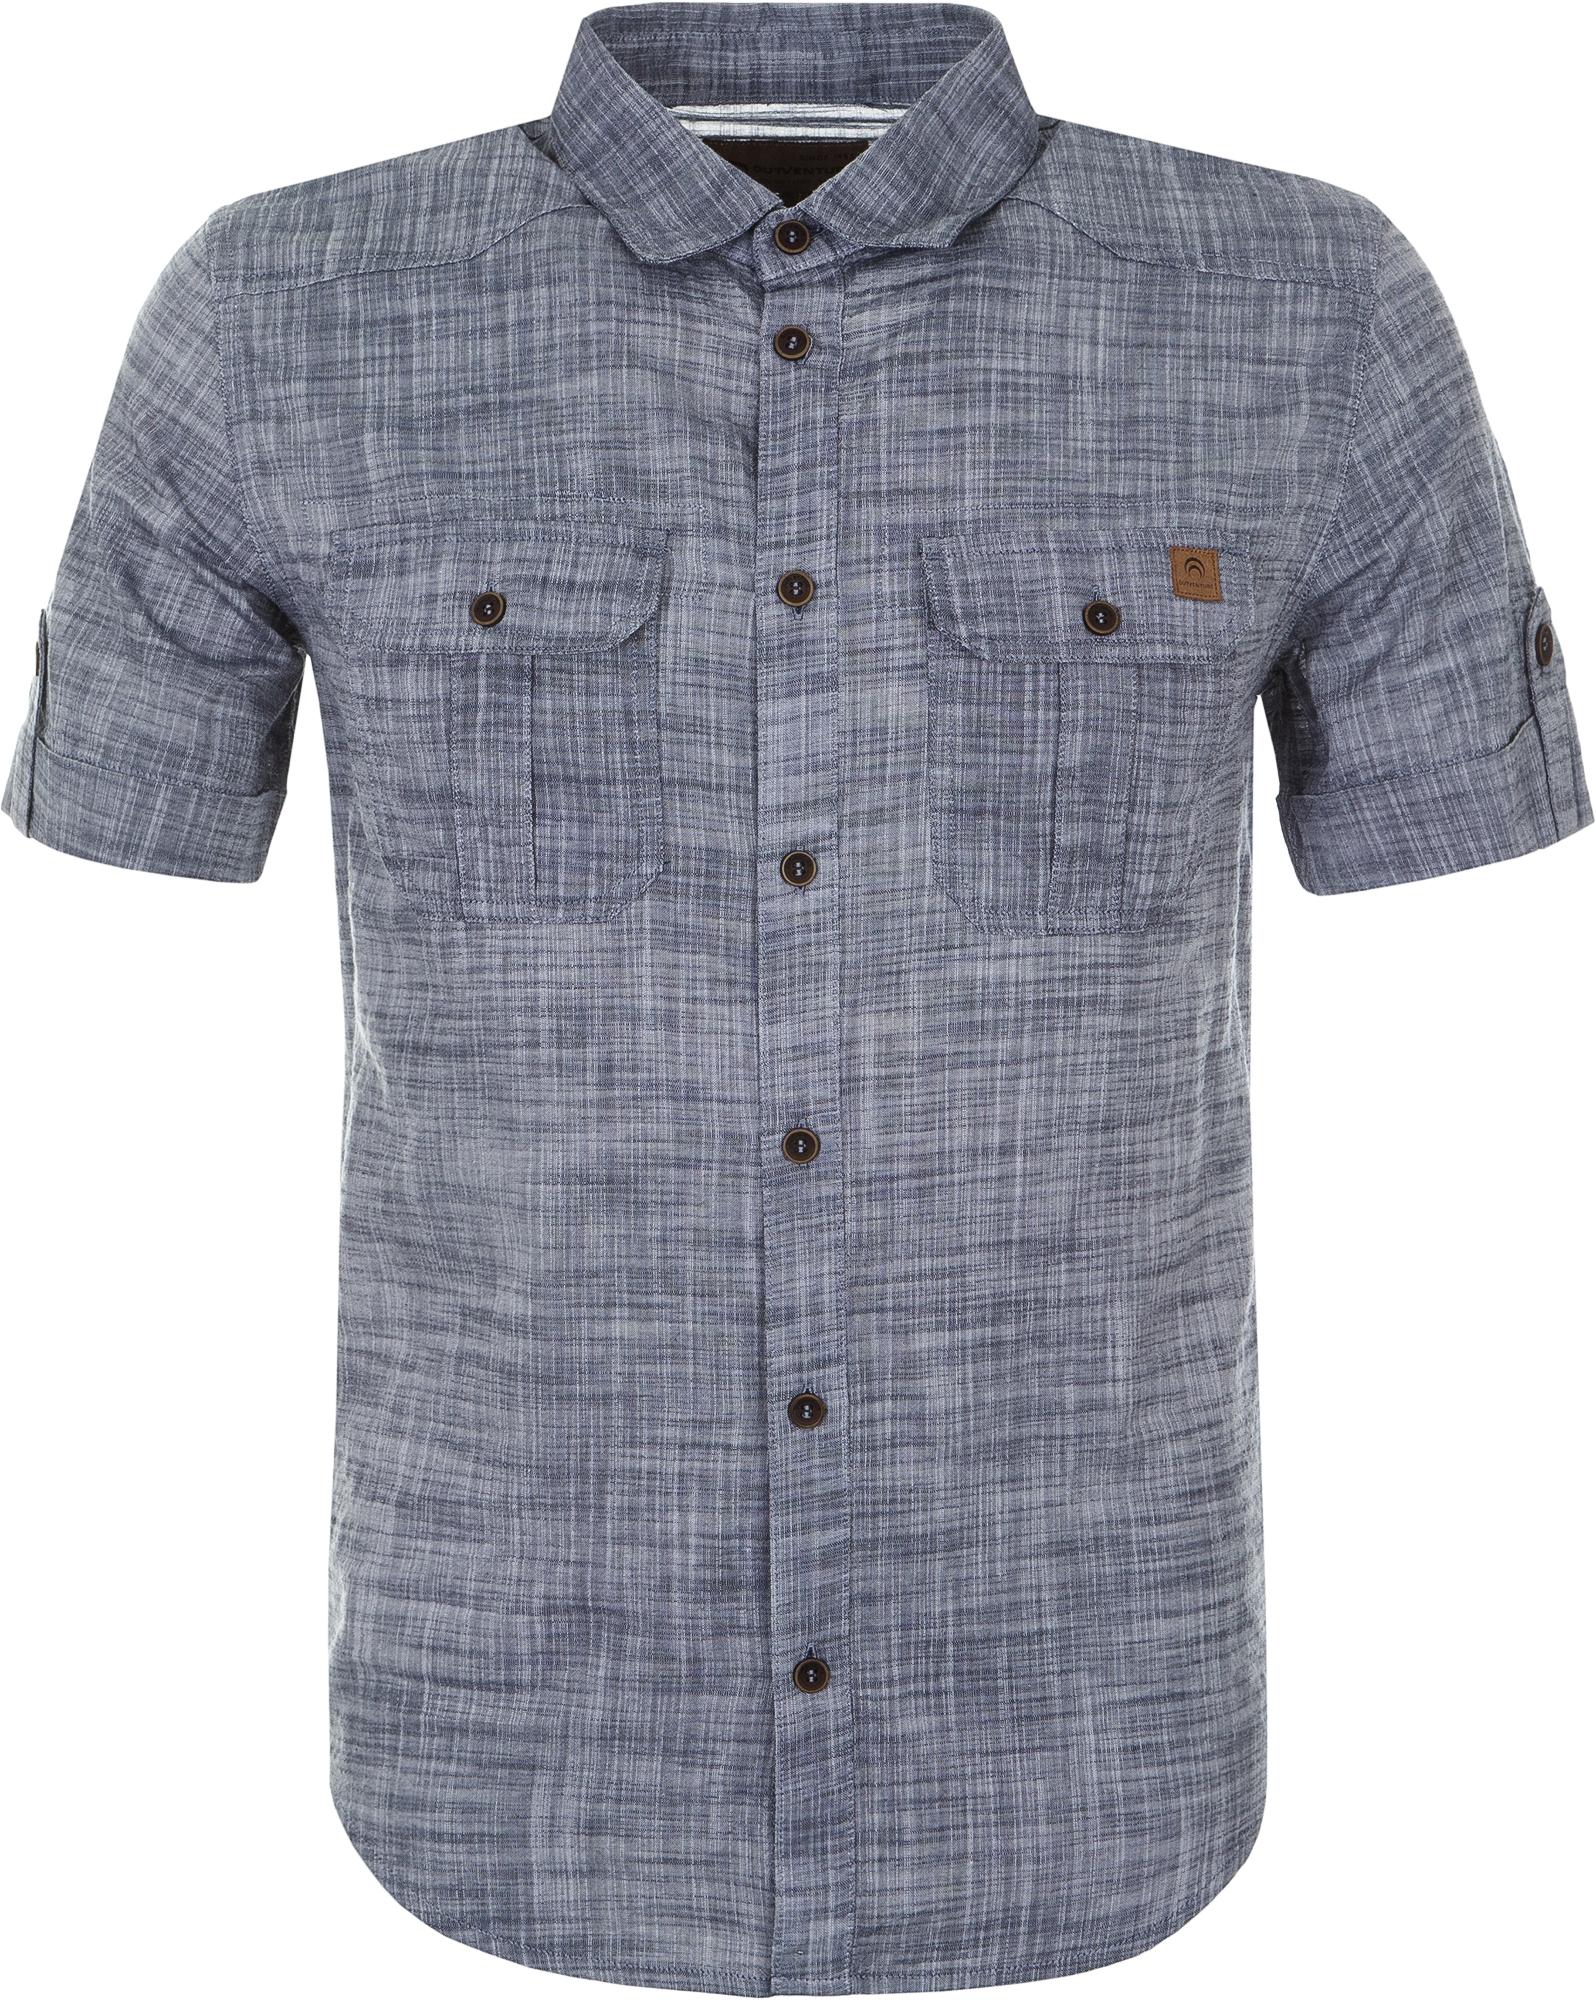 Outventure Рубашка мужская Outventure, размер 58